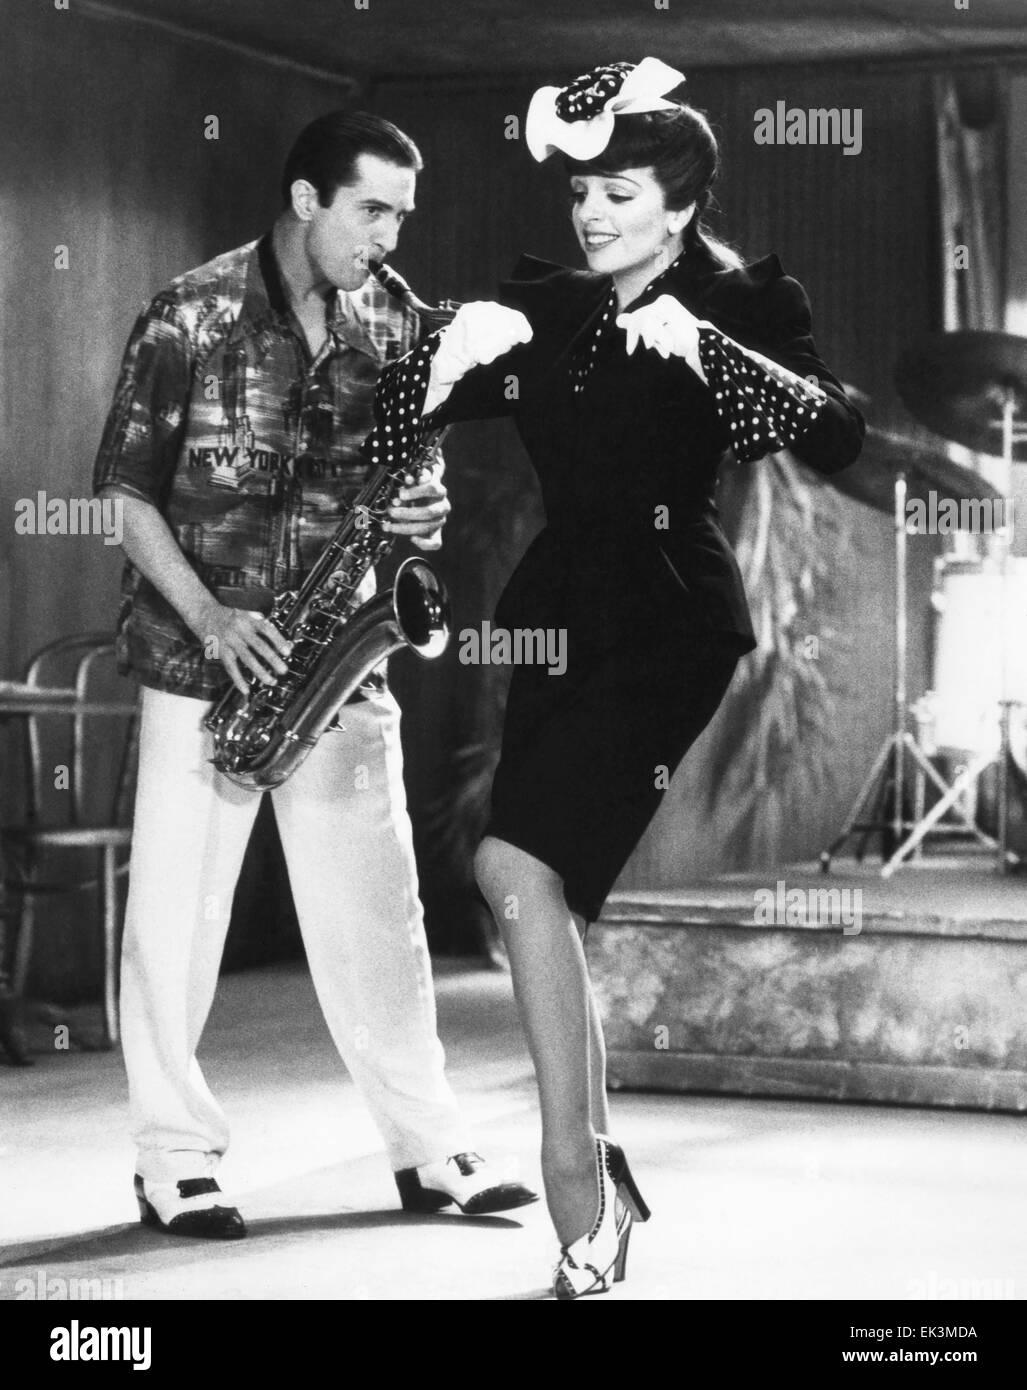 Robert De Niro, Liza Minnelli, on-set of the Film 'New York, New York', 1977 - Stock Image